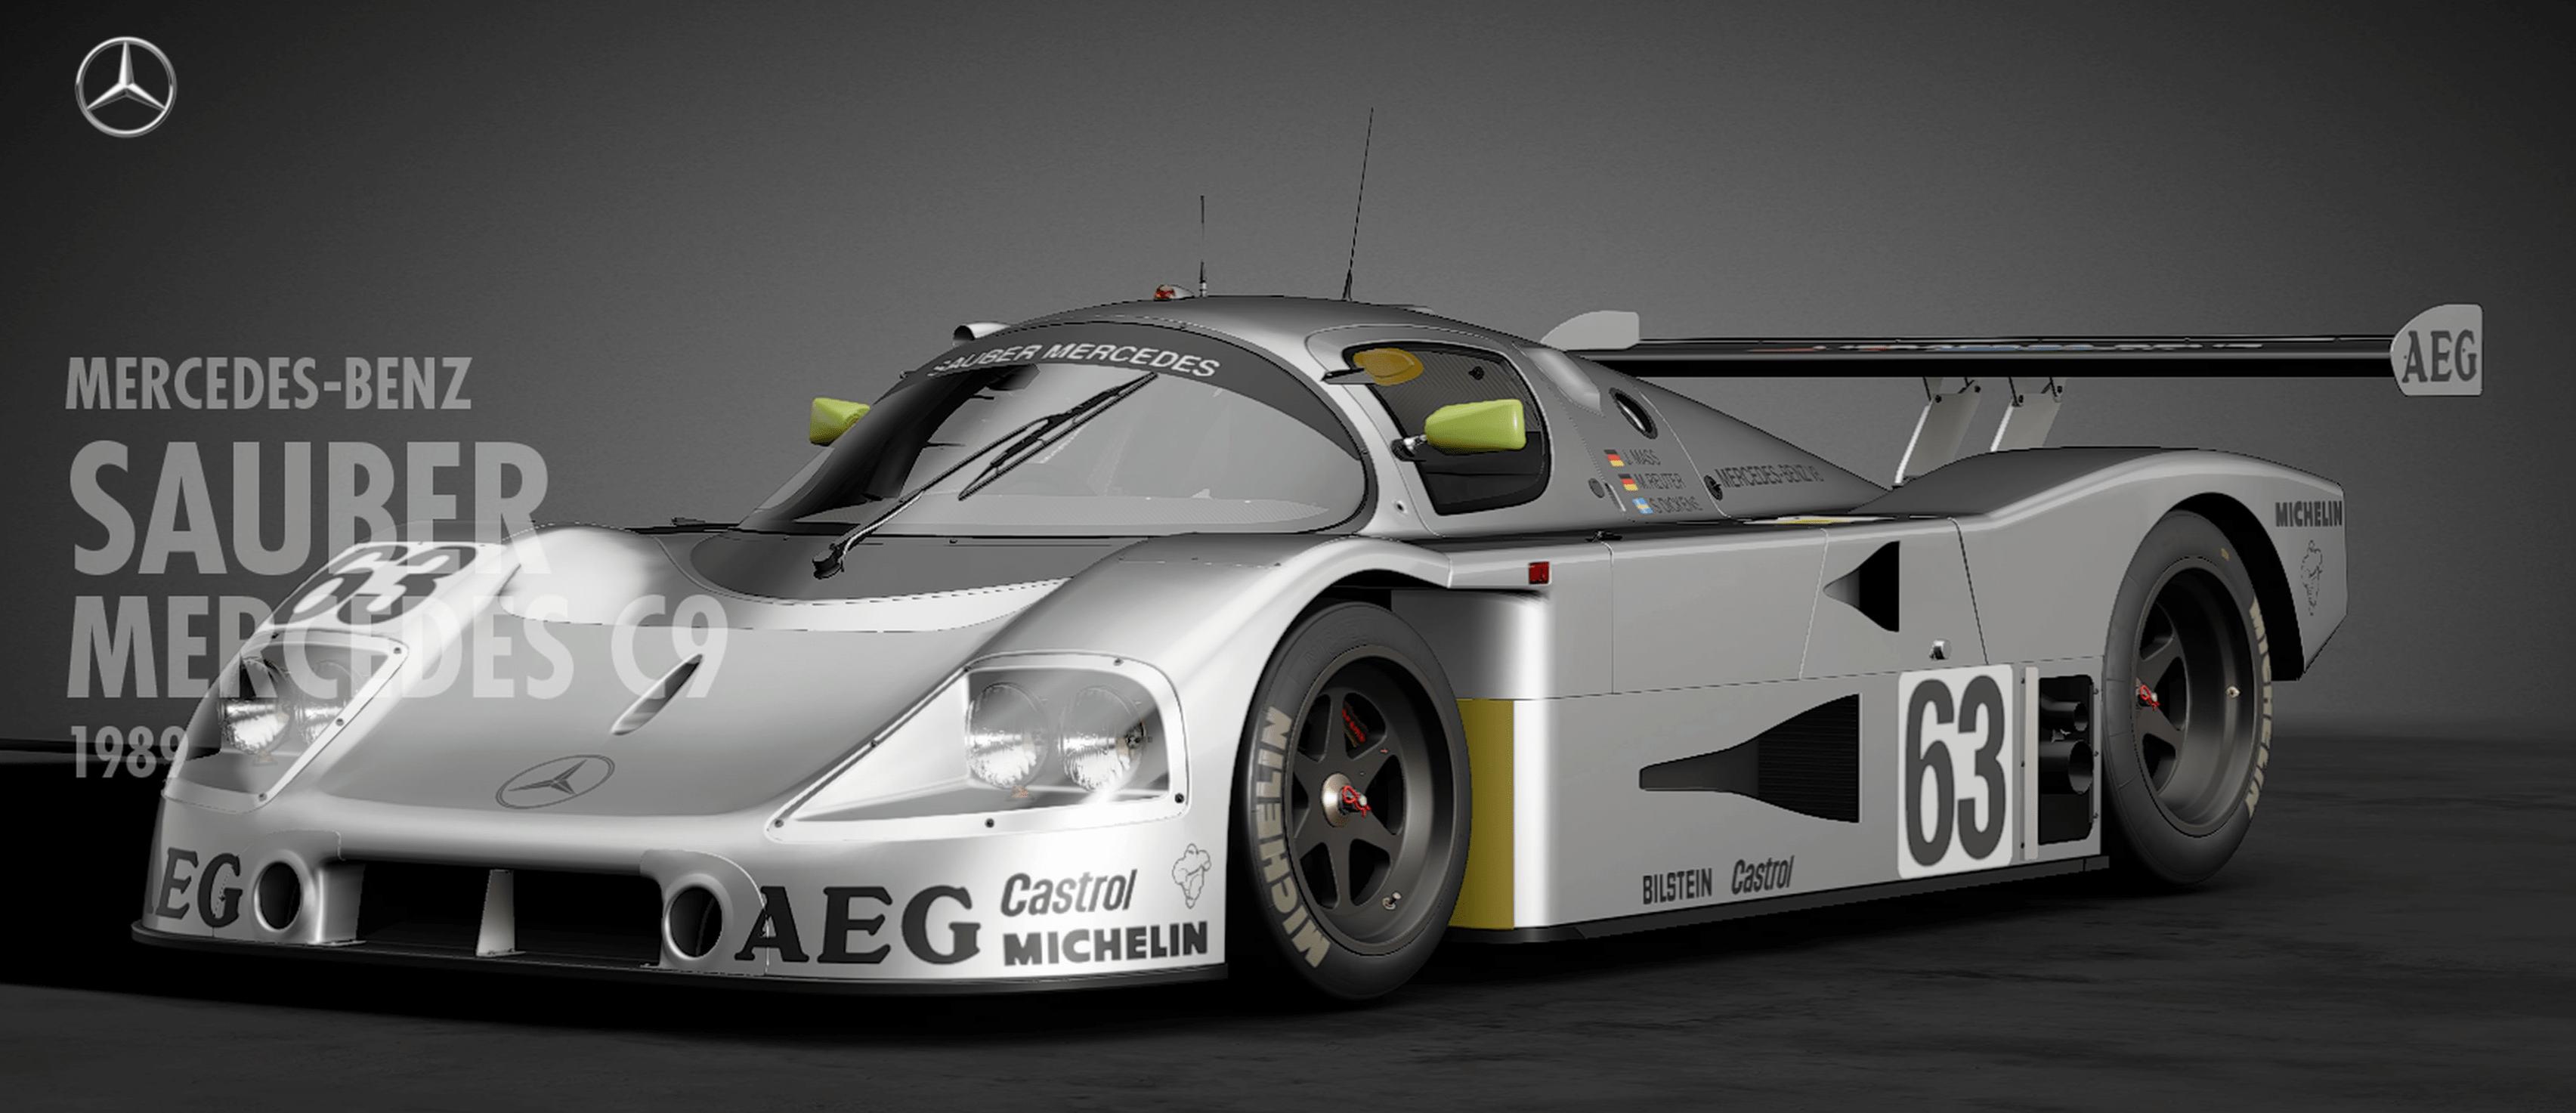 GT SPORT「ザウバー メルセデス C9」性能/入手方法 | プロイド - GameNews